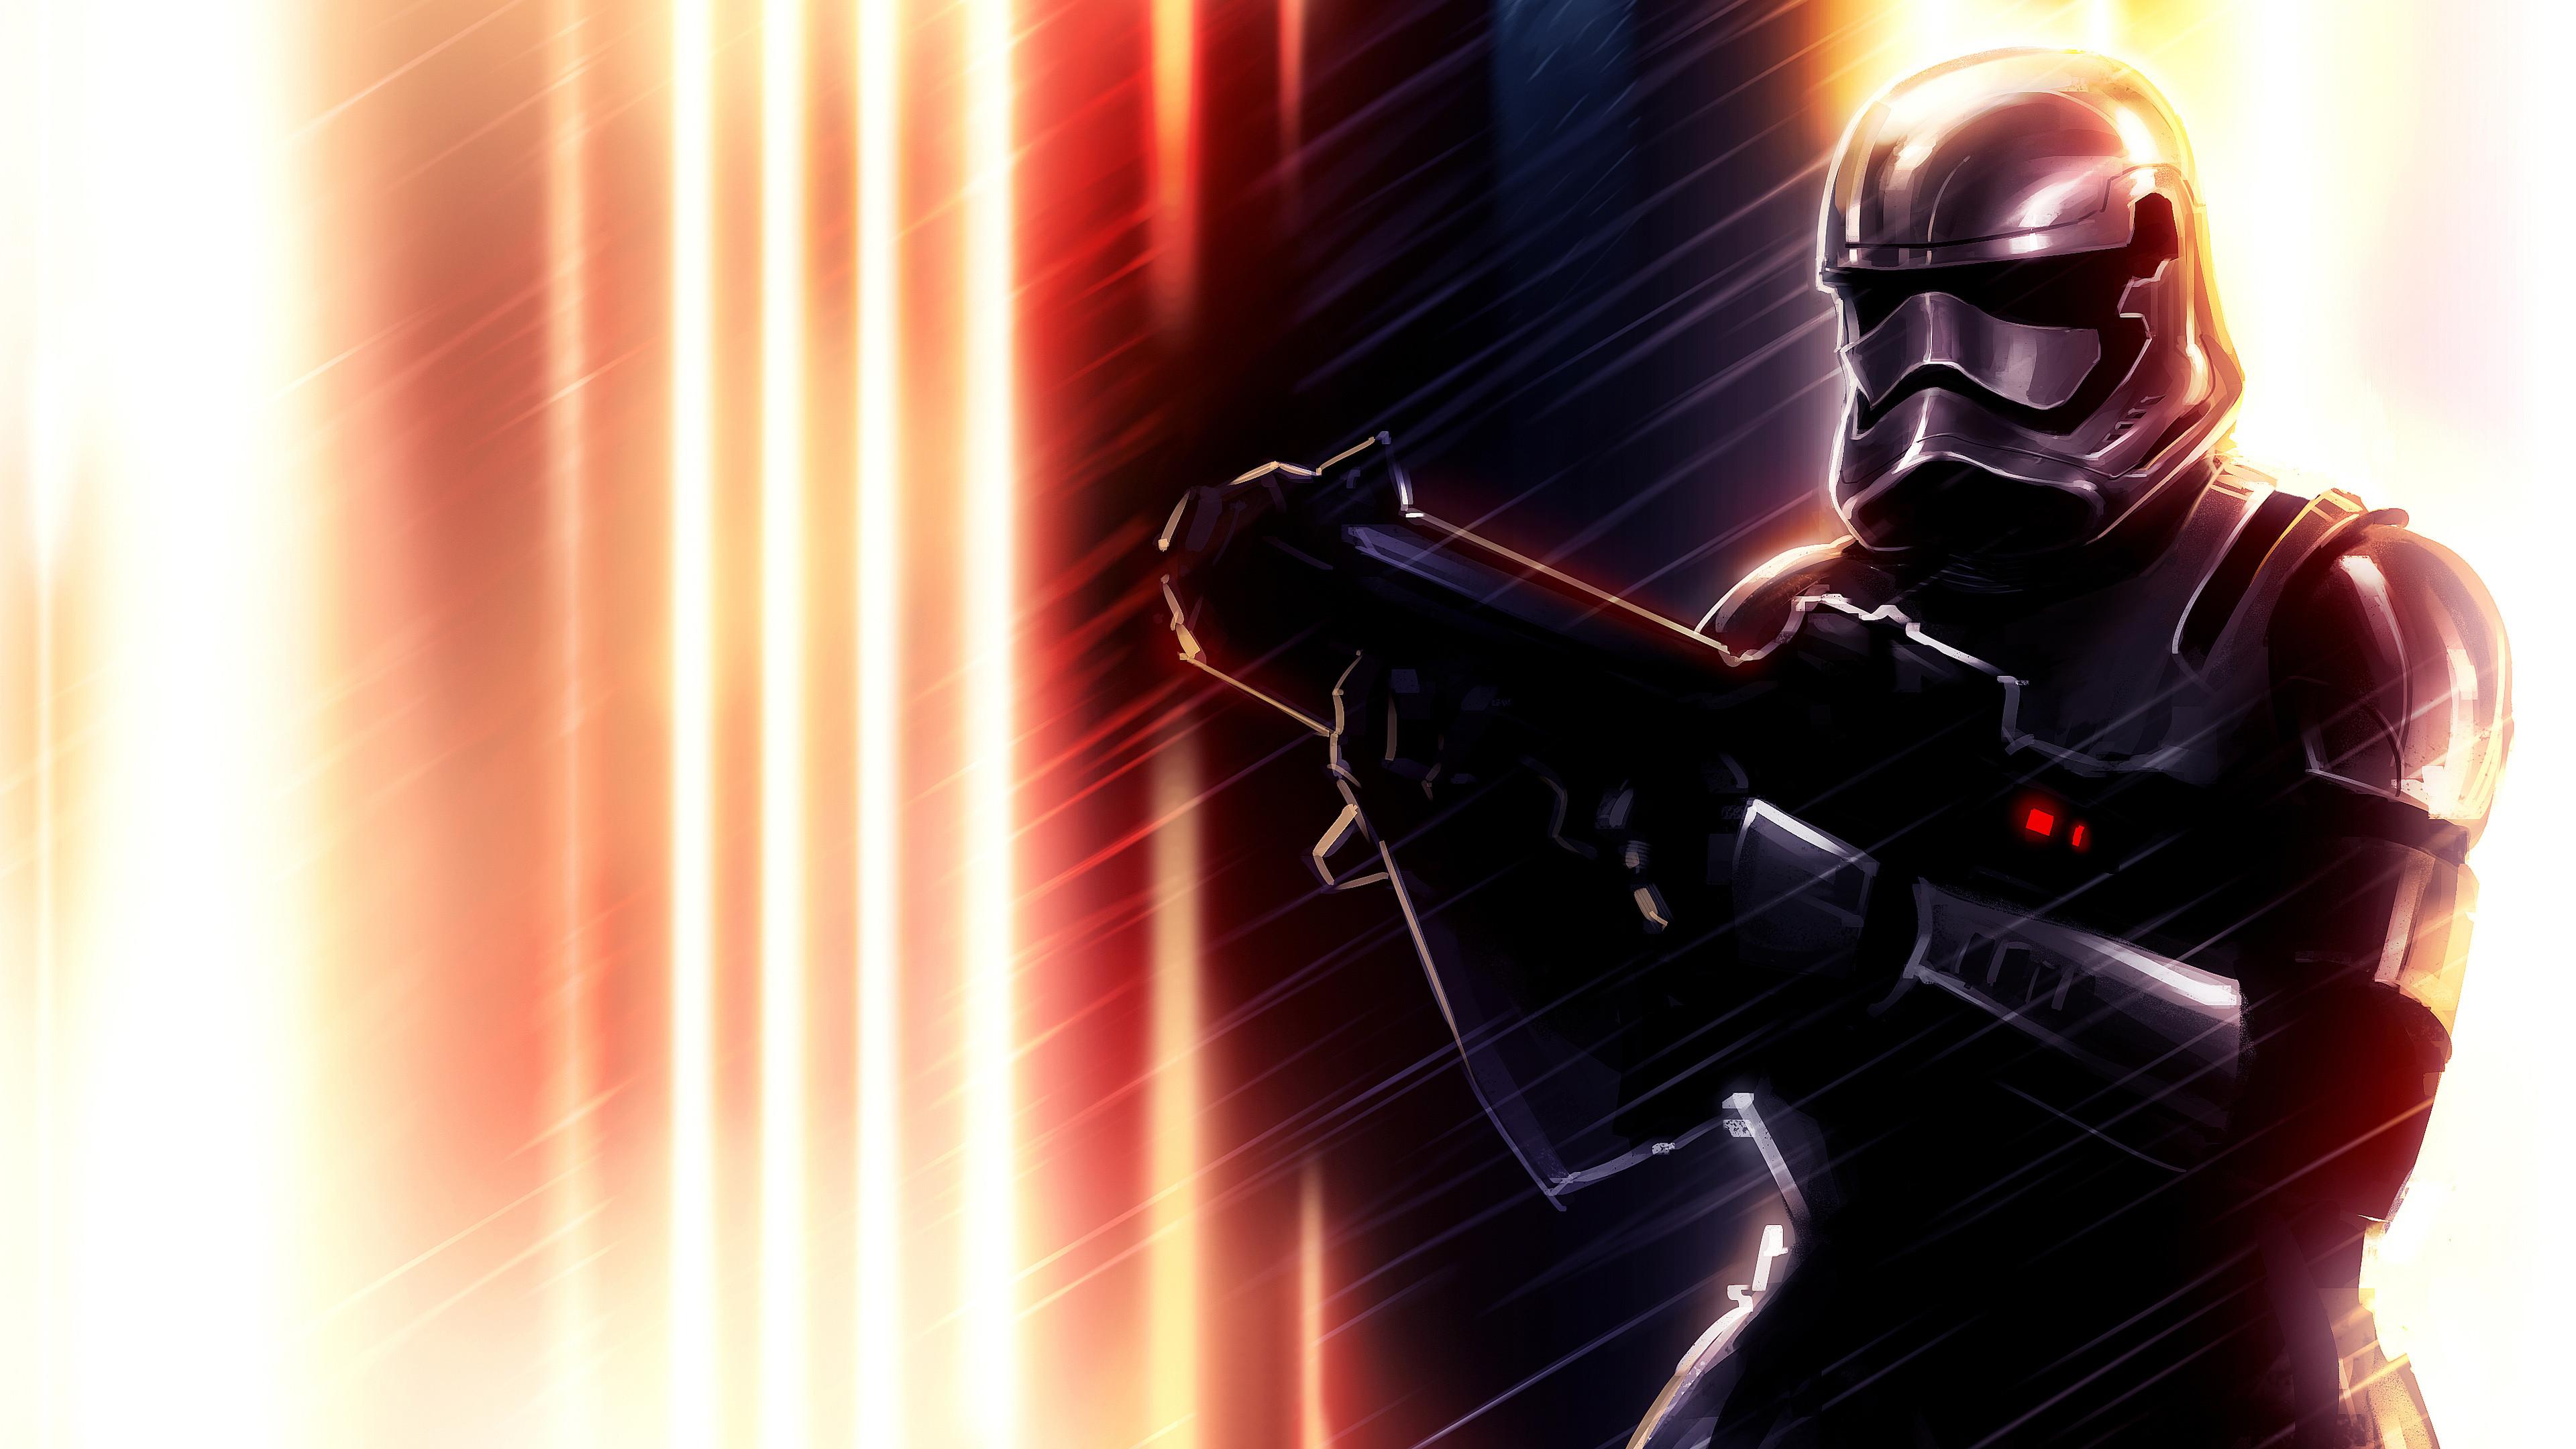 Stormtrooper. Stormtrooper. Wallpaper: Stormtrooper